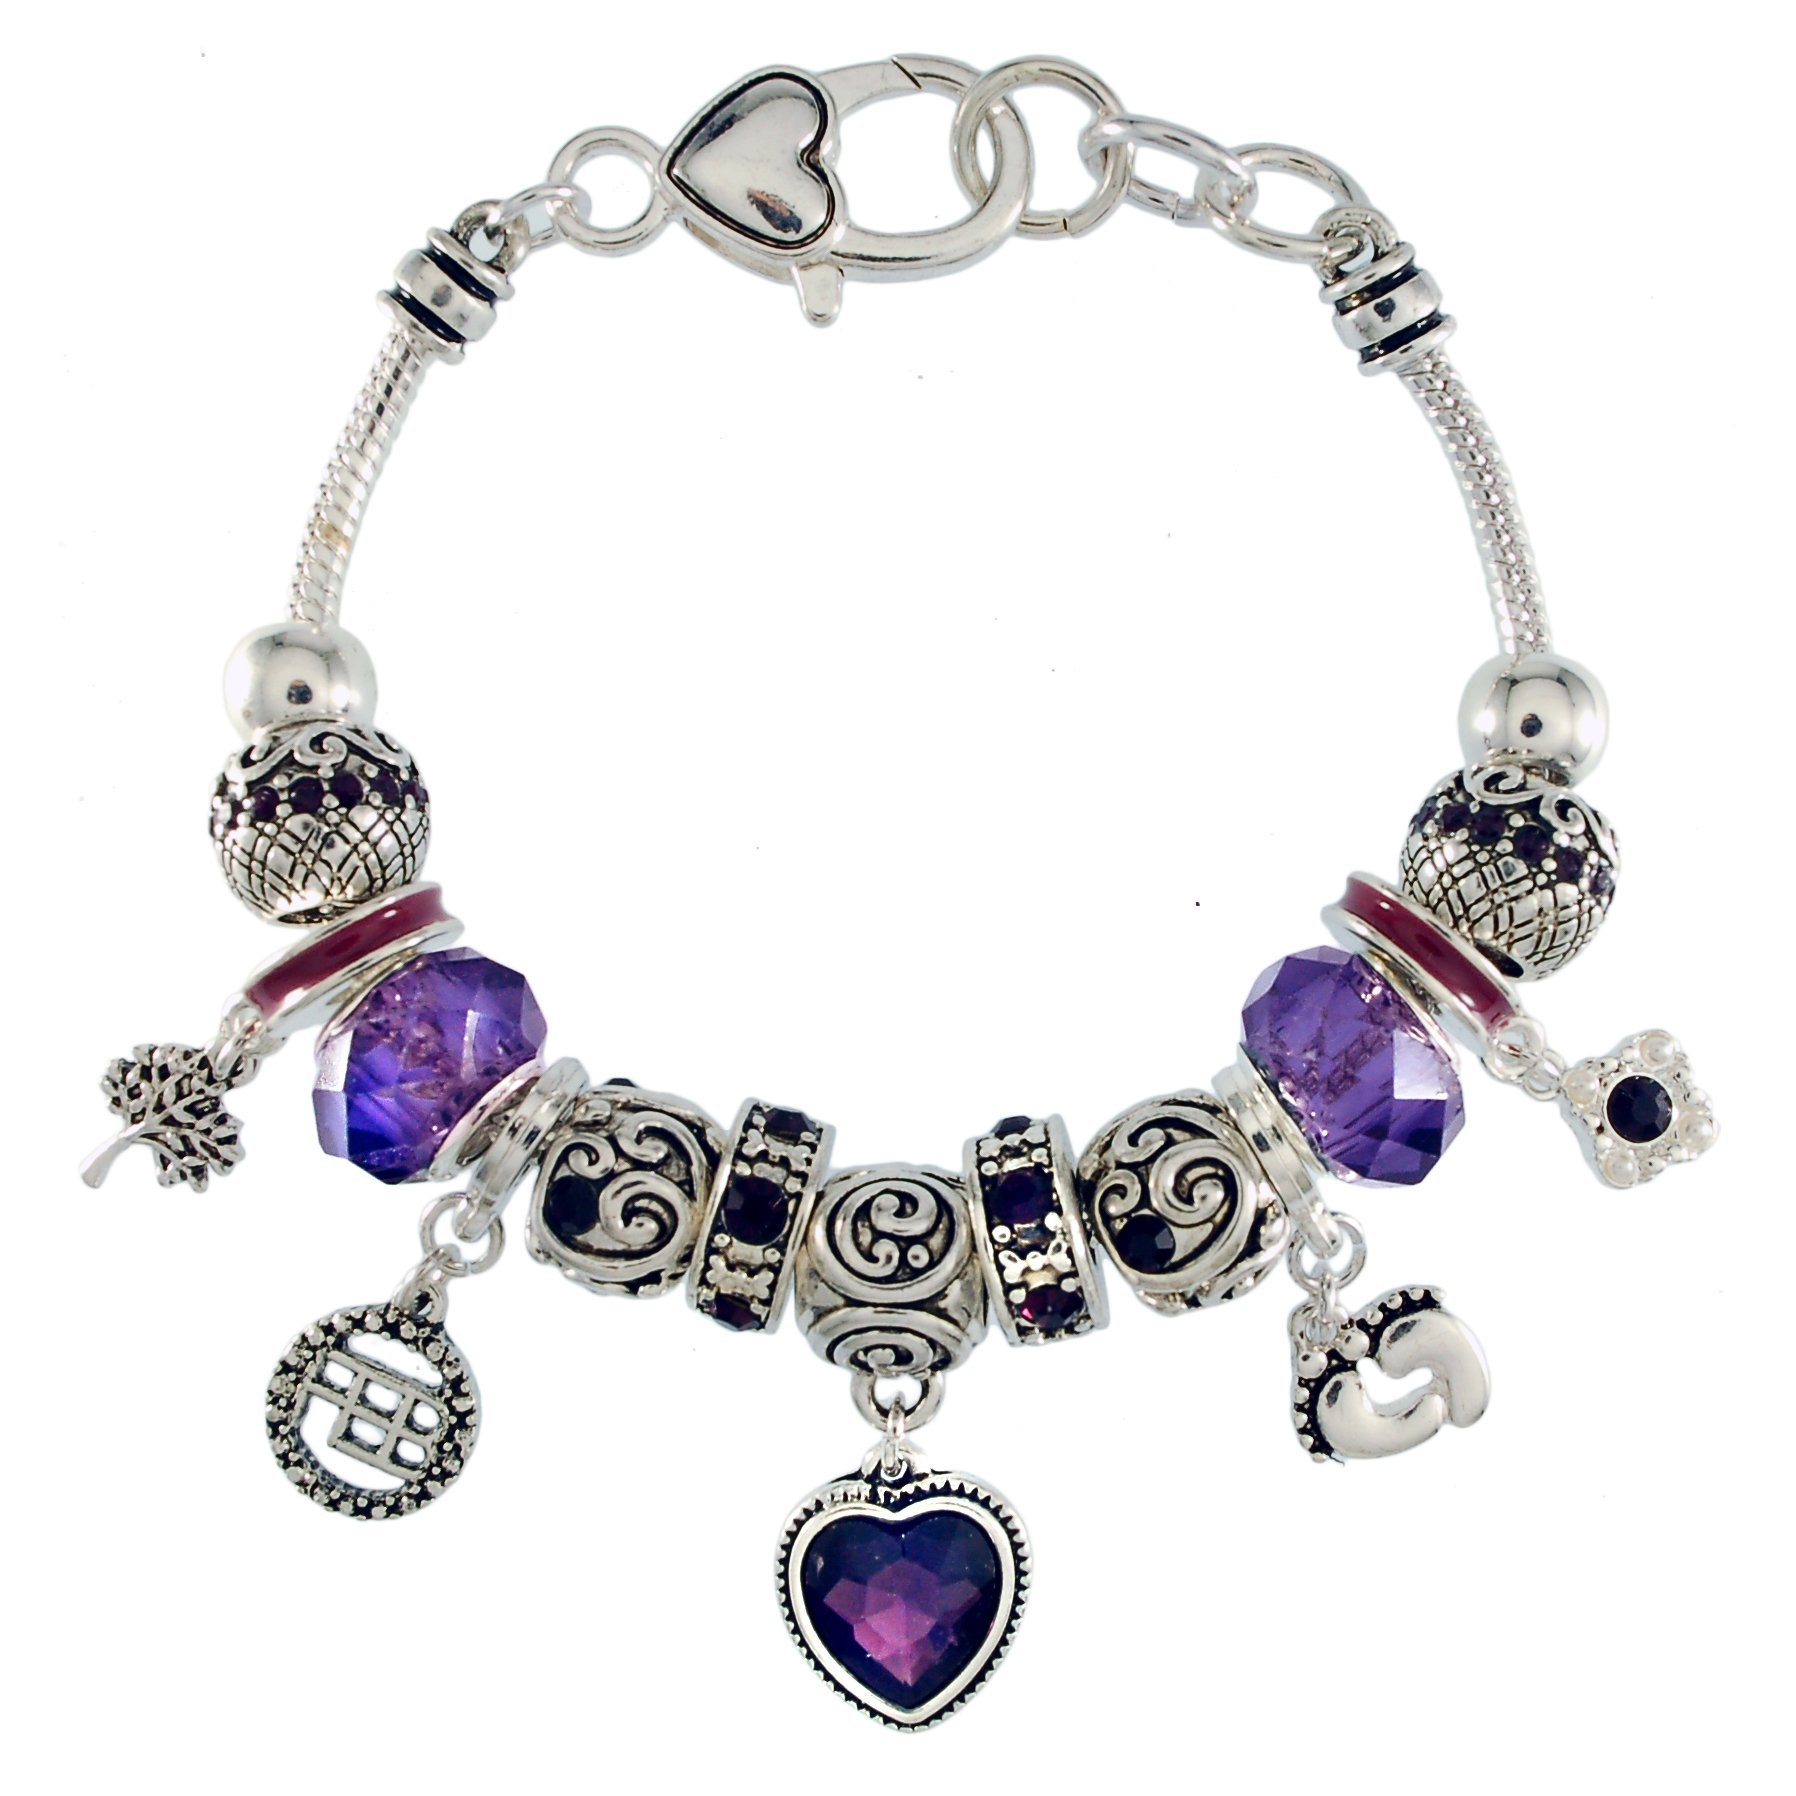 Landau Ambrosia February Birthstone Charm Bracelet